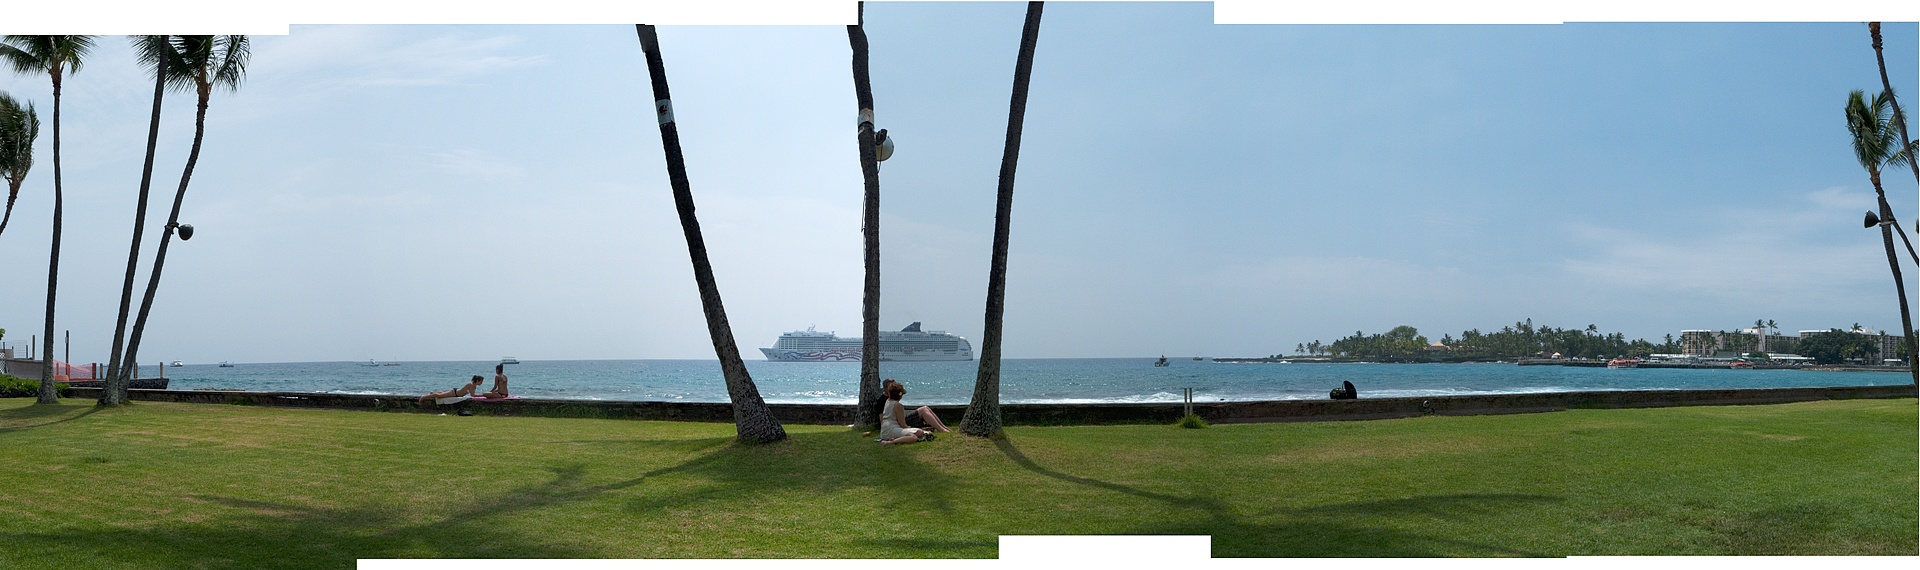 Kona Cruiseship